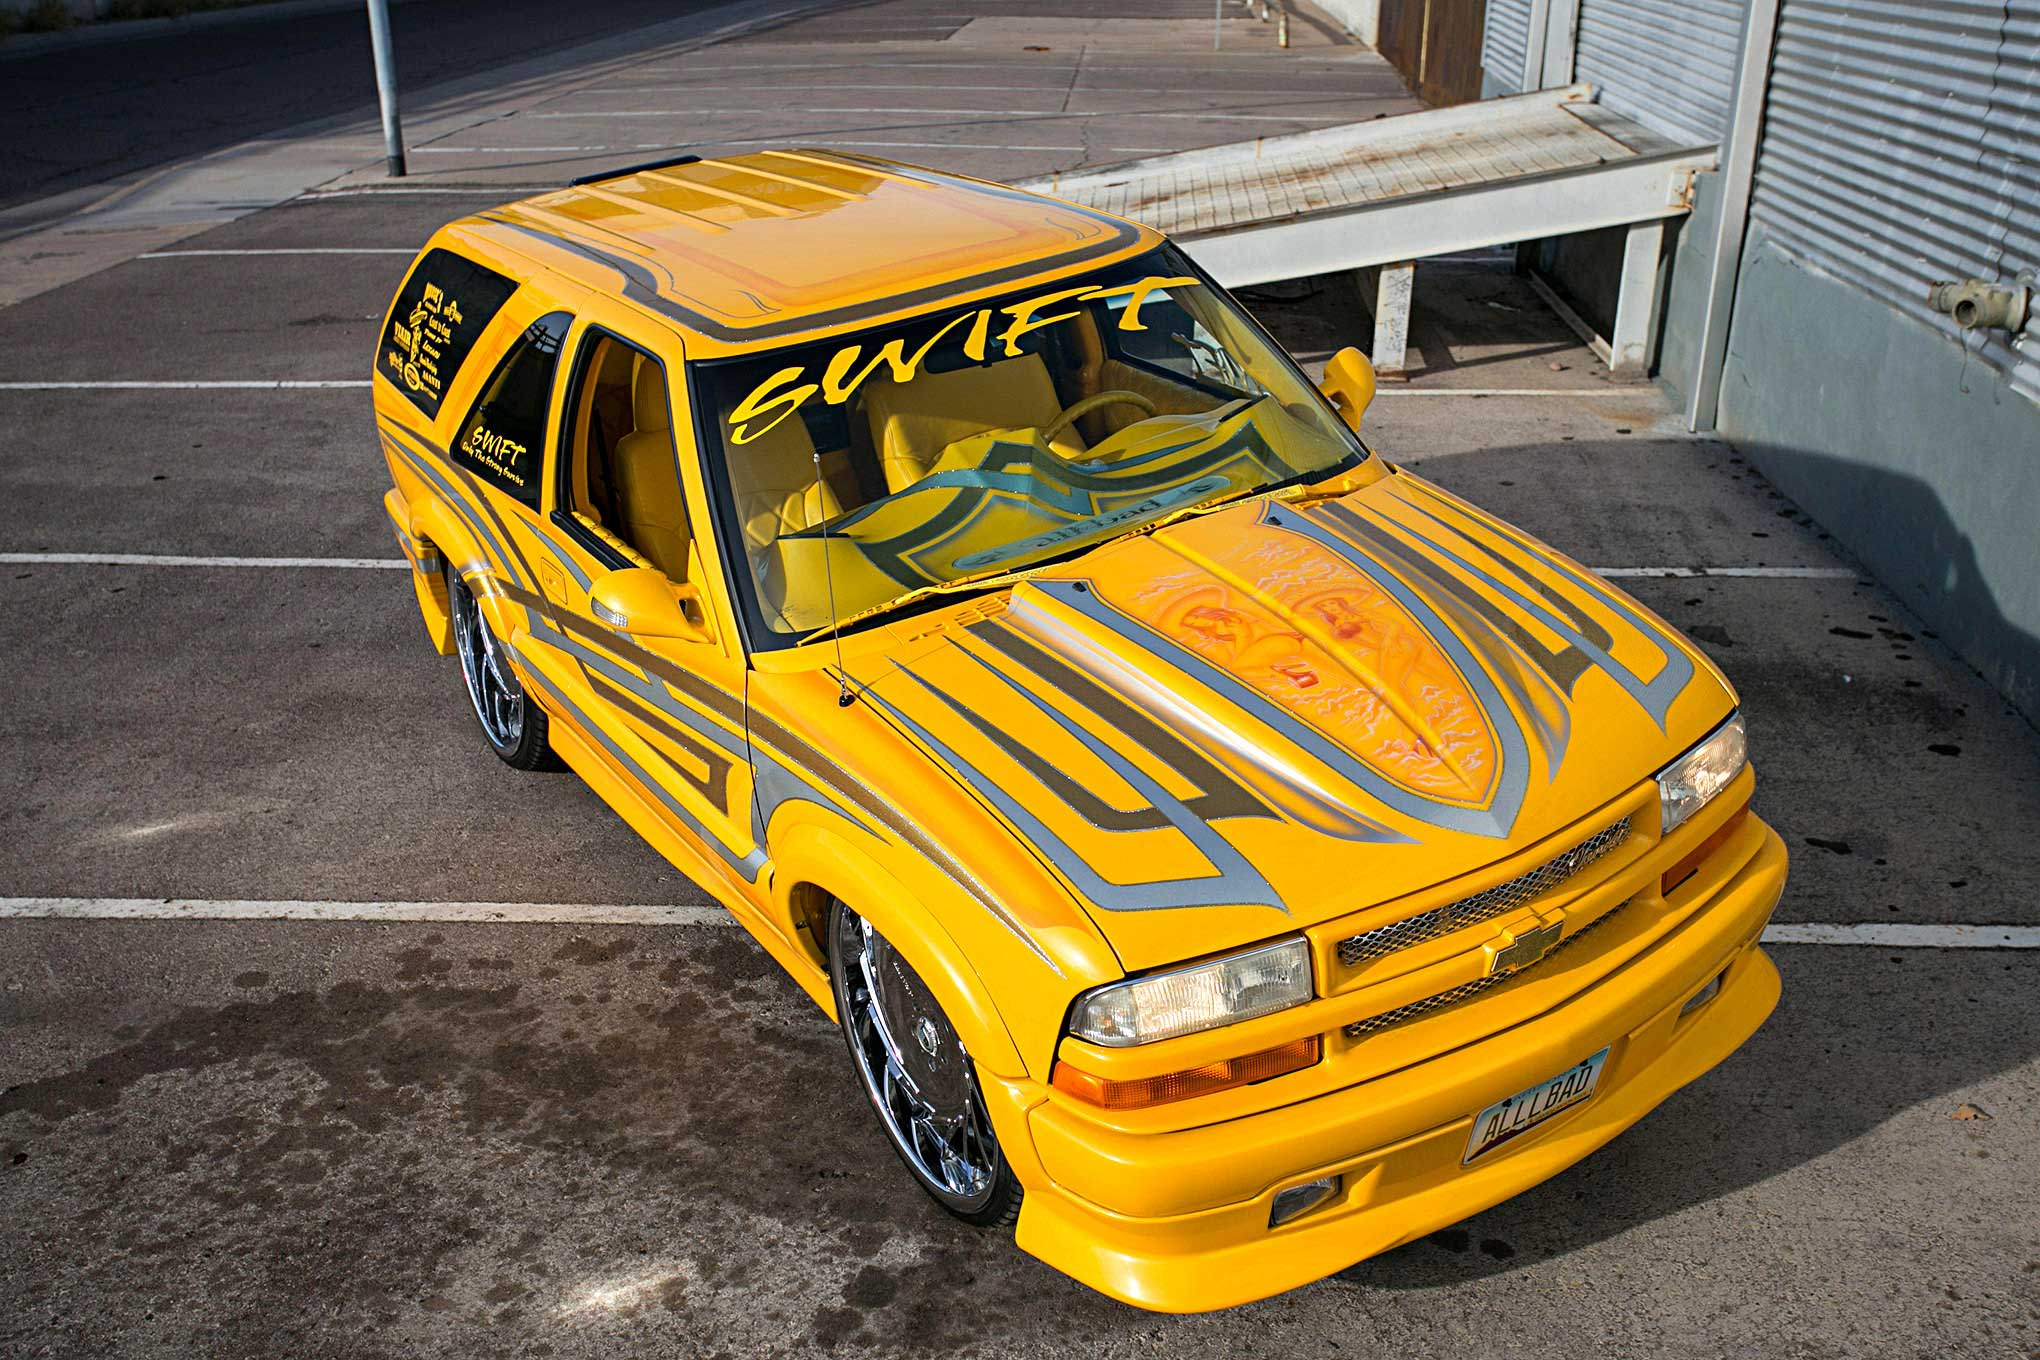 2003 Chevy Blazer Xtreme